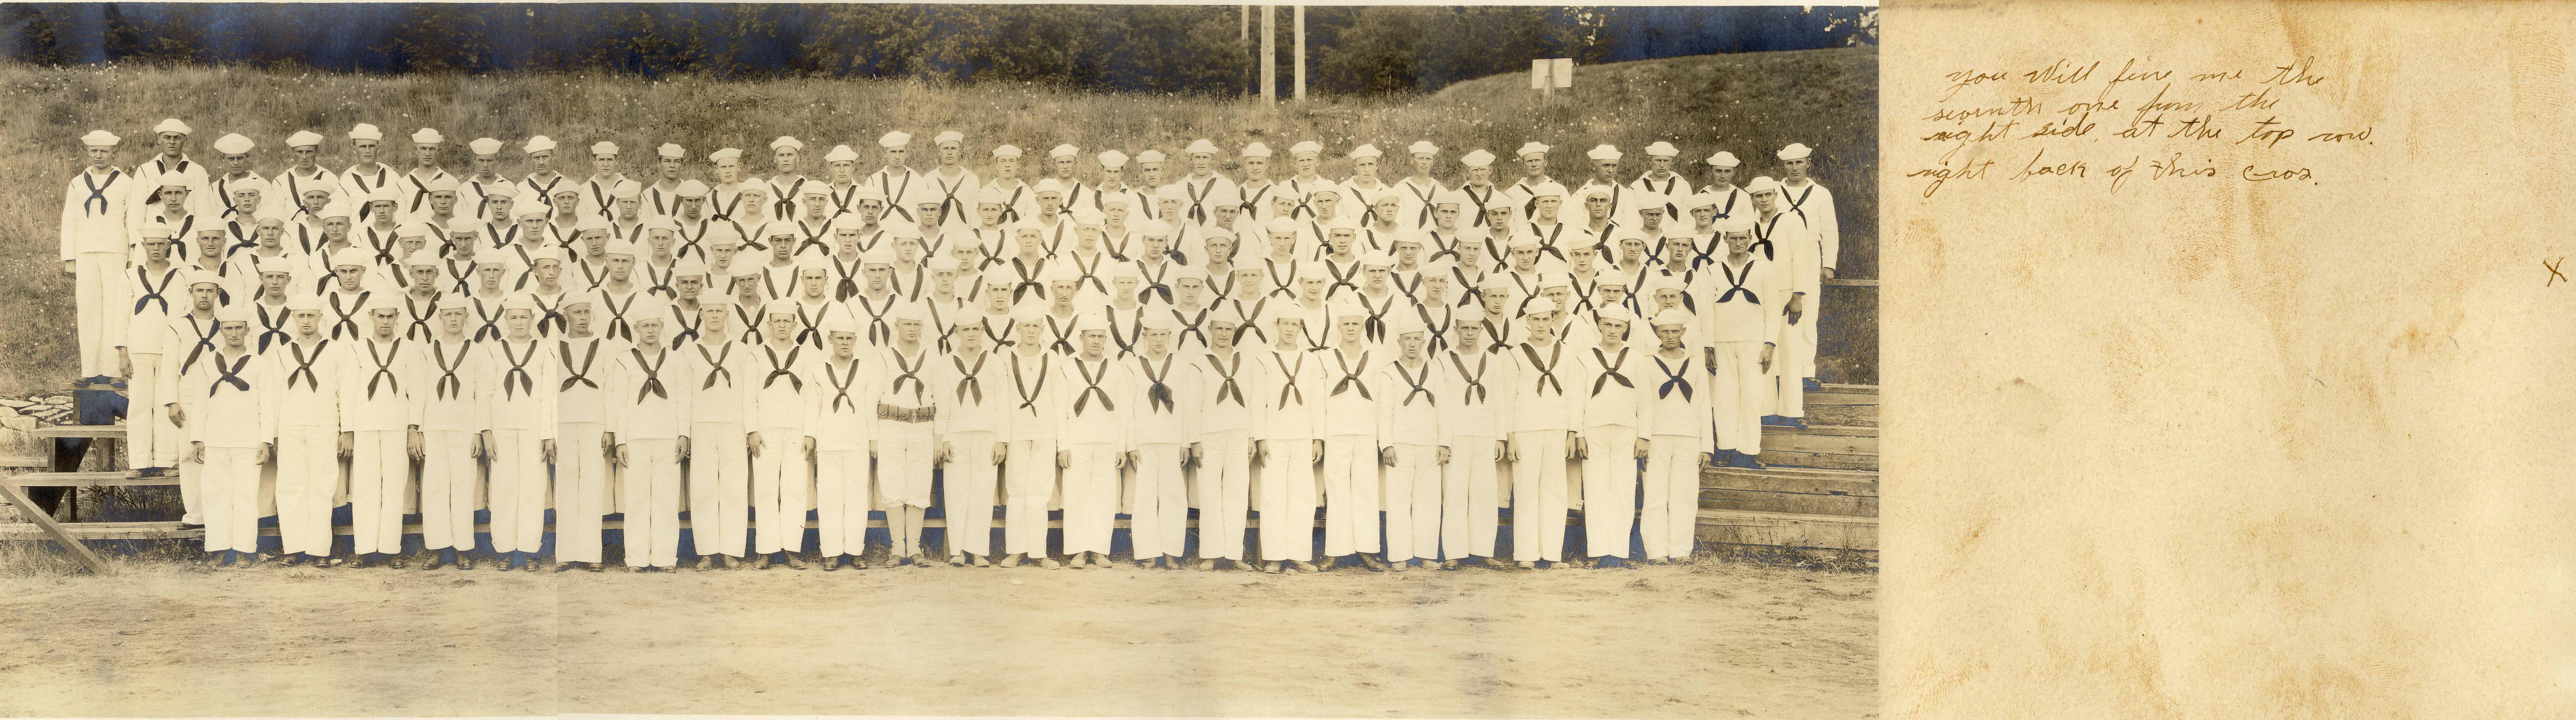 seamen